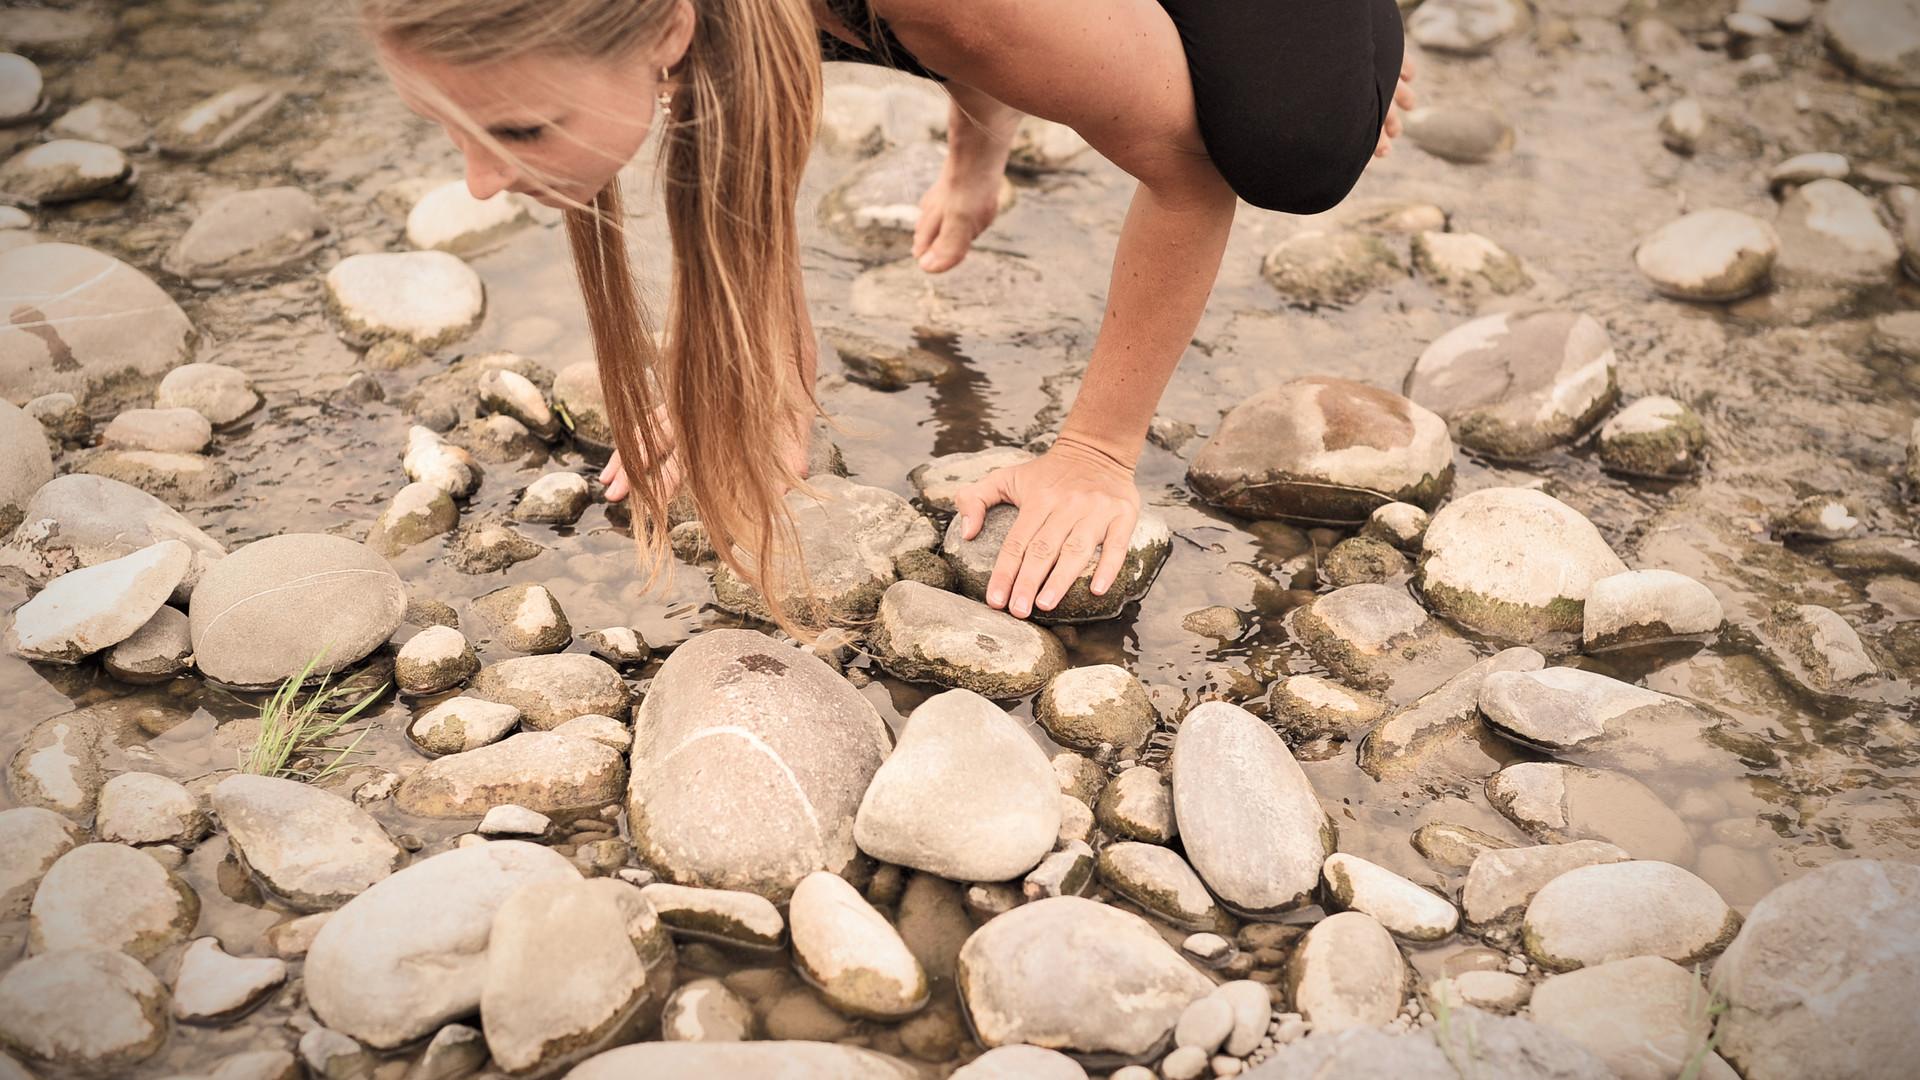 Bakasana Yoga |Katharina Kirchner | Sonnengruss Yoga & Psychologie